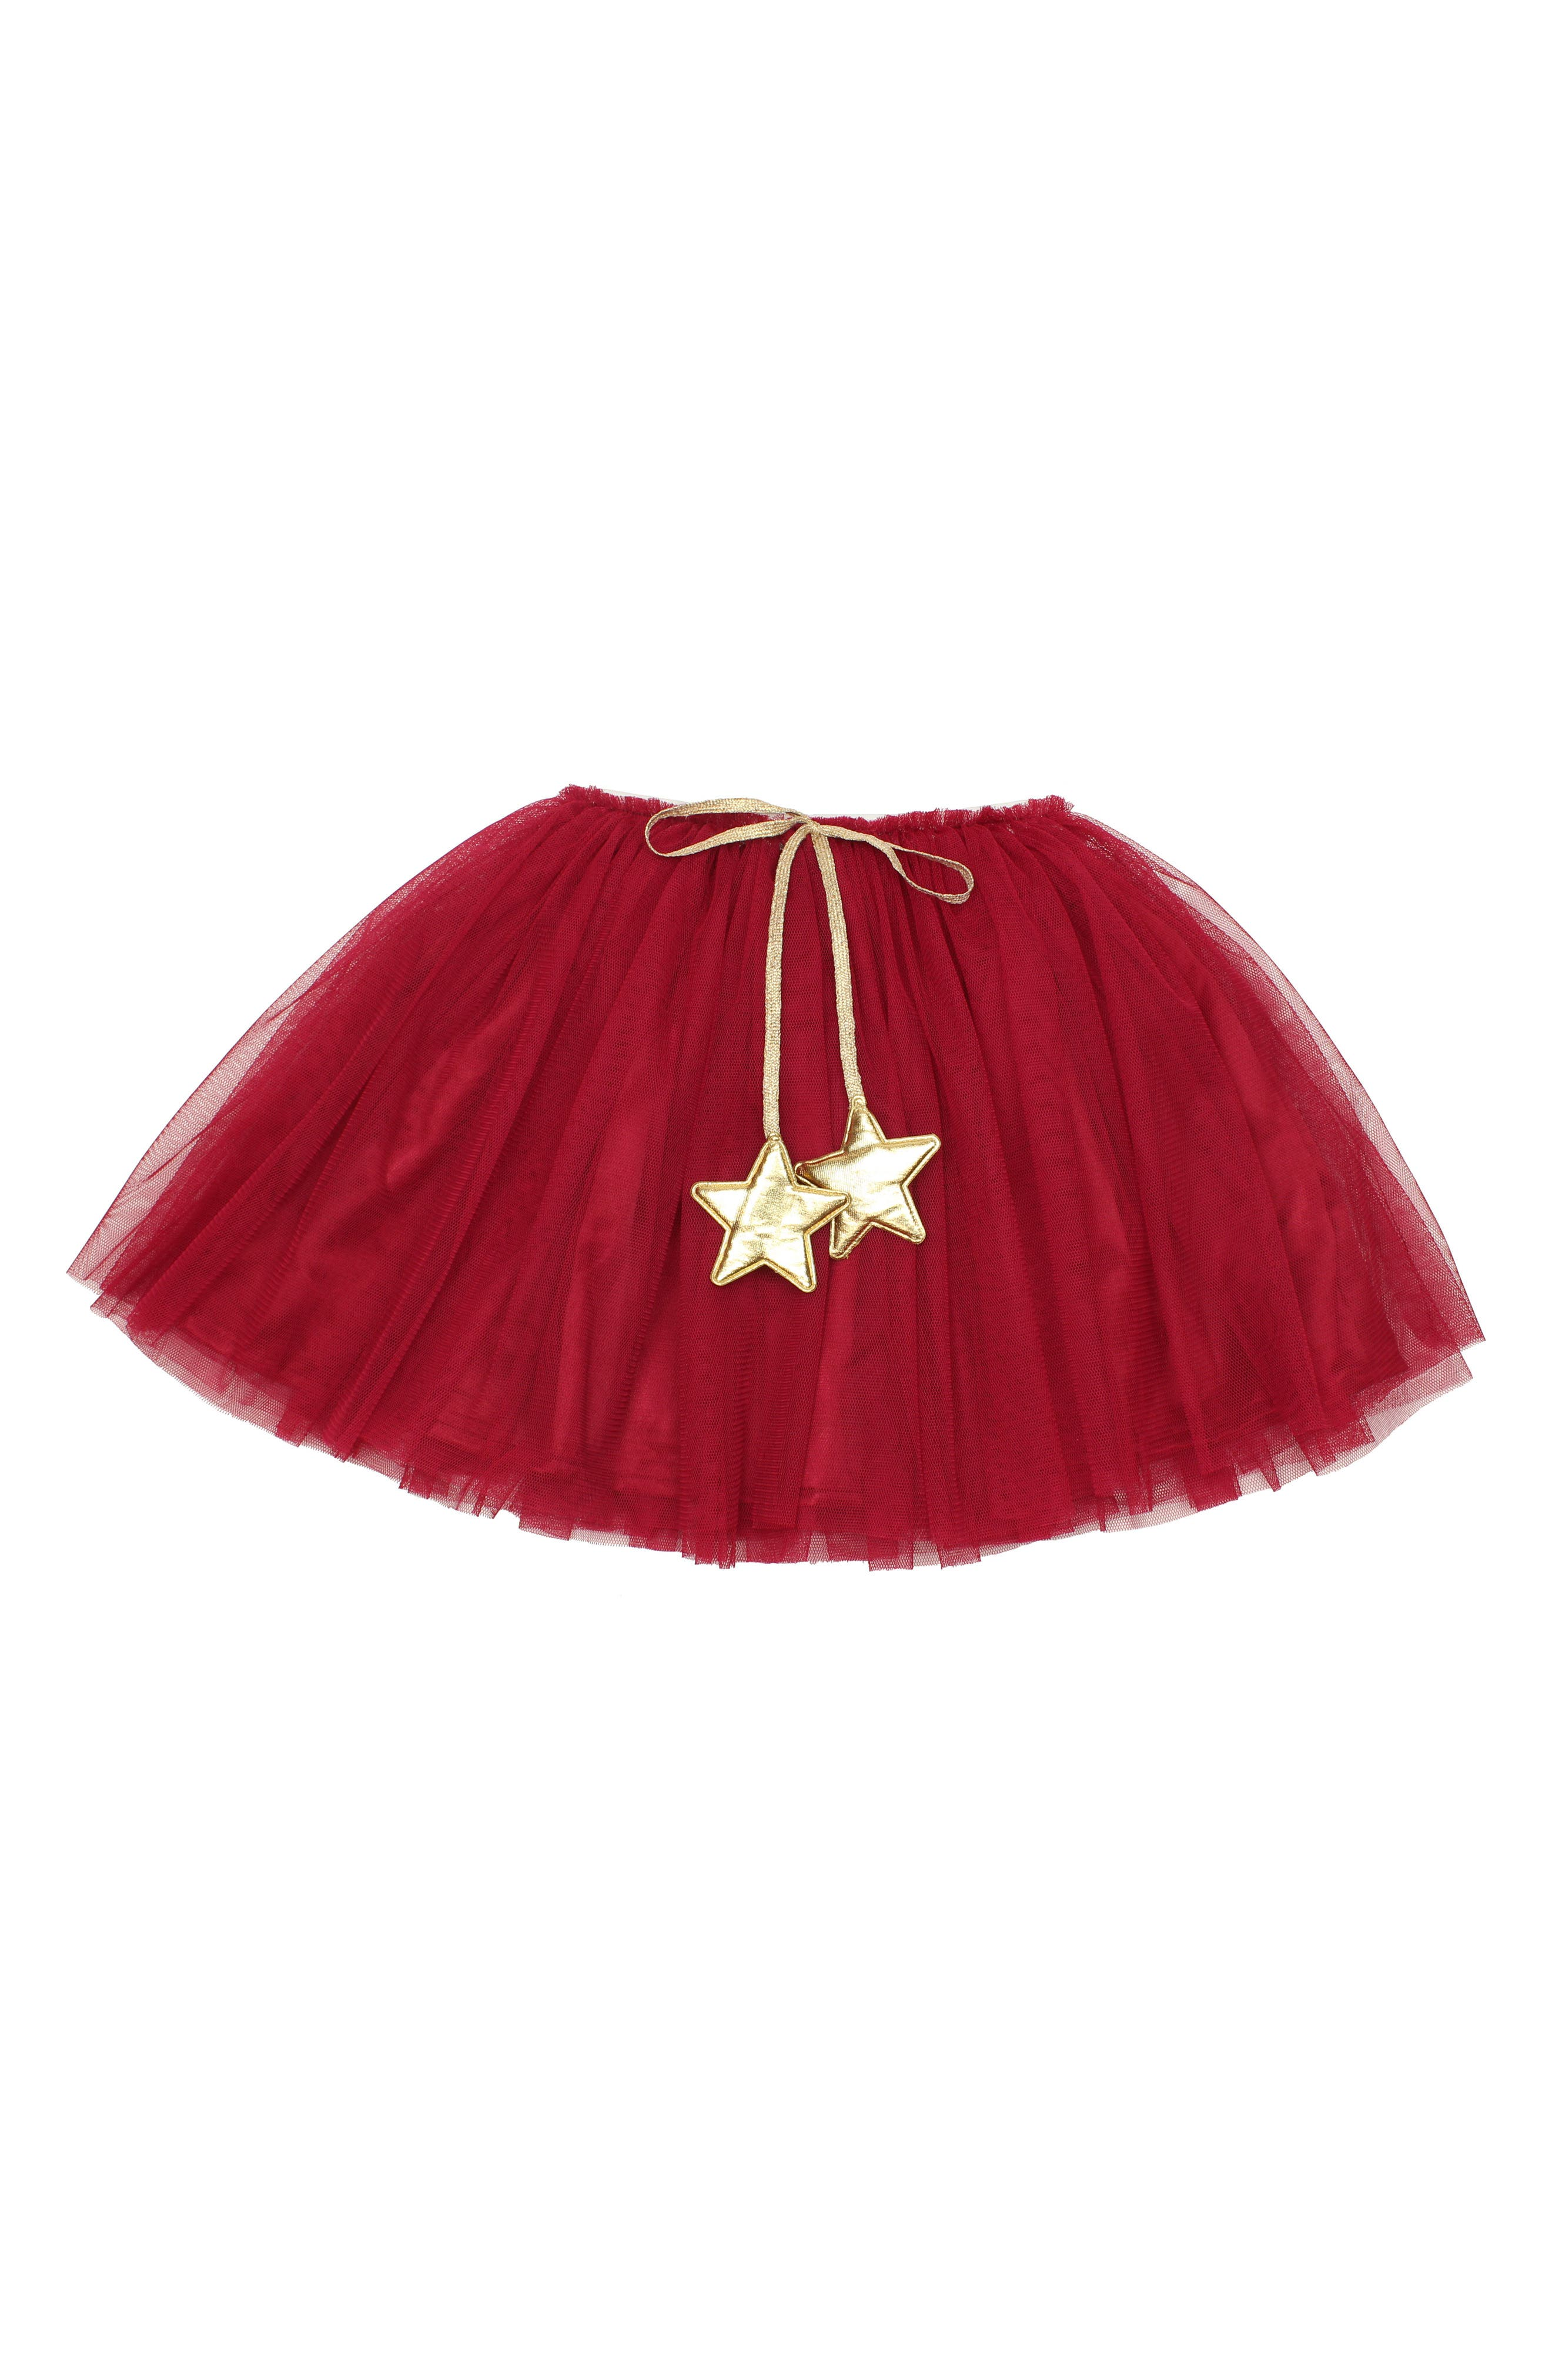 POPATU, Gold Star Tutu Skirt, Main thumbnail 1, color, BURGUNDY